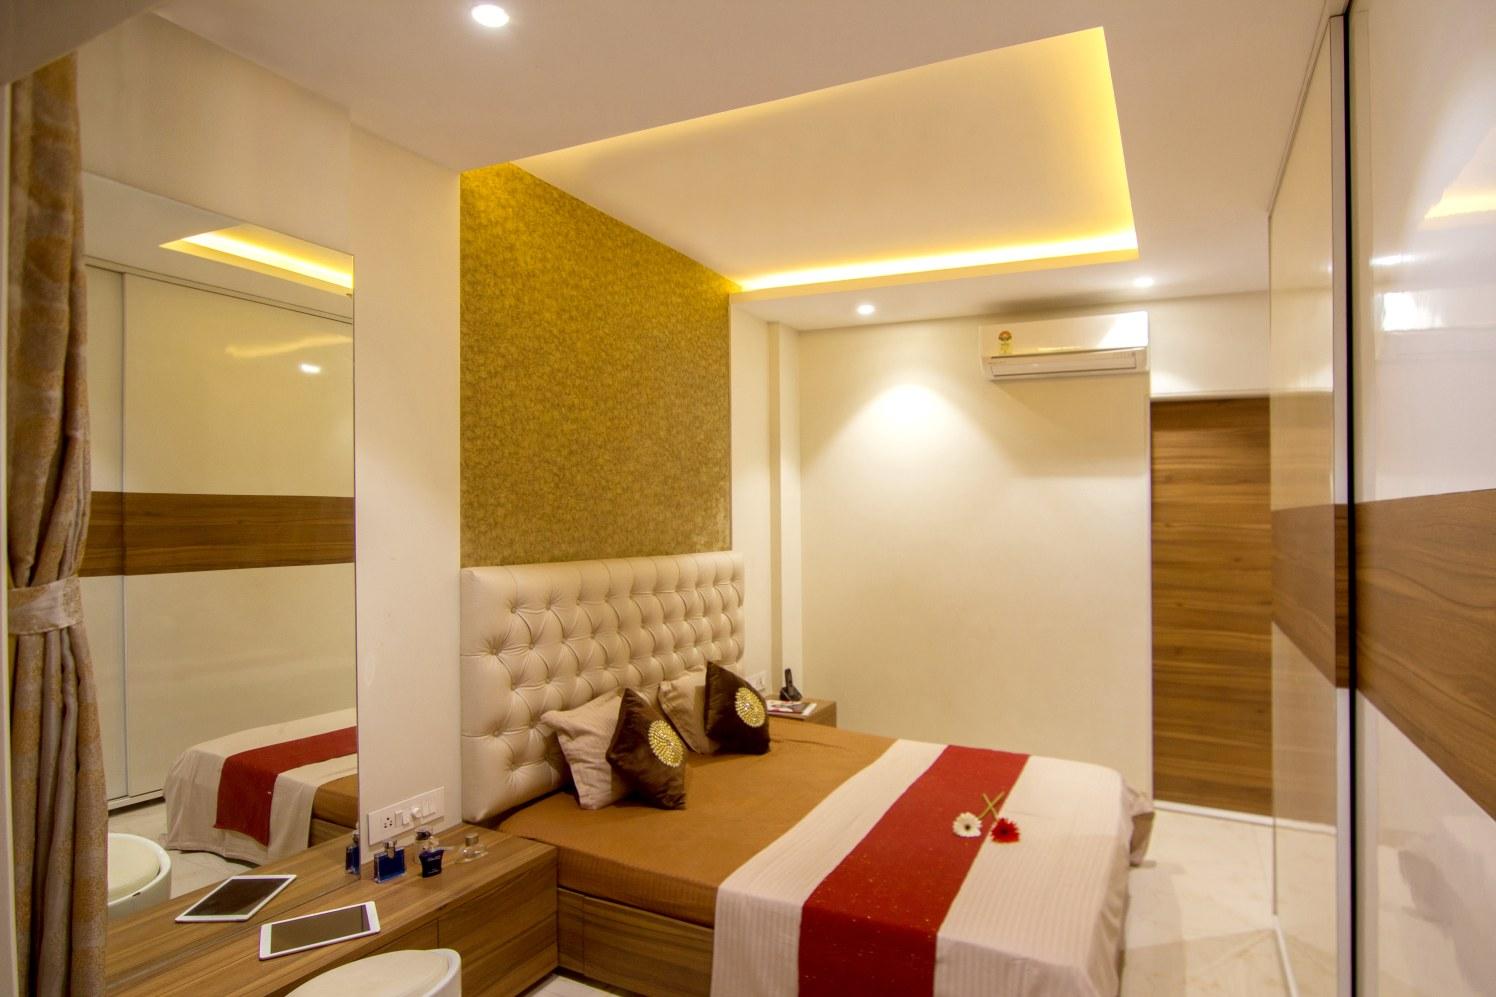 Bedroom by Rupali Naik Modern | Interior Design Photos & Ideas